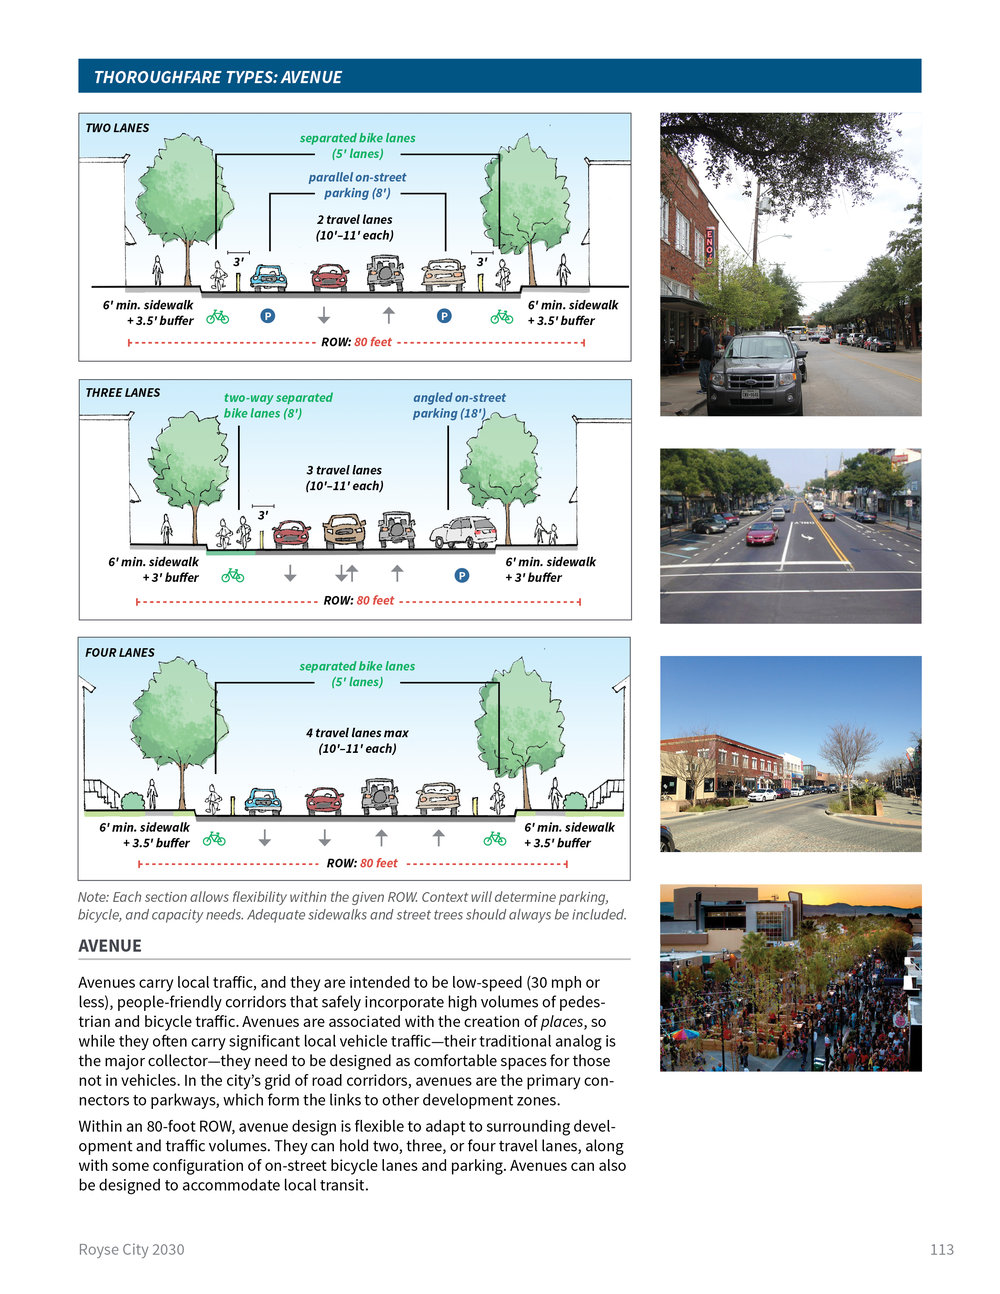 Royse City 2030 Mobility Example.jpg